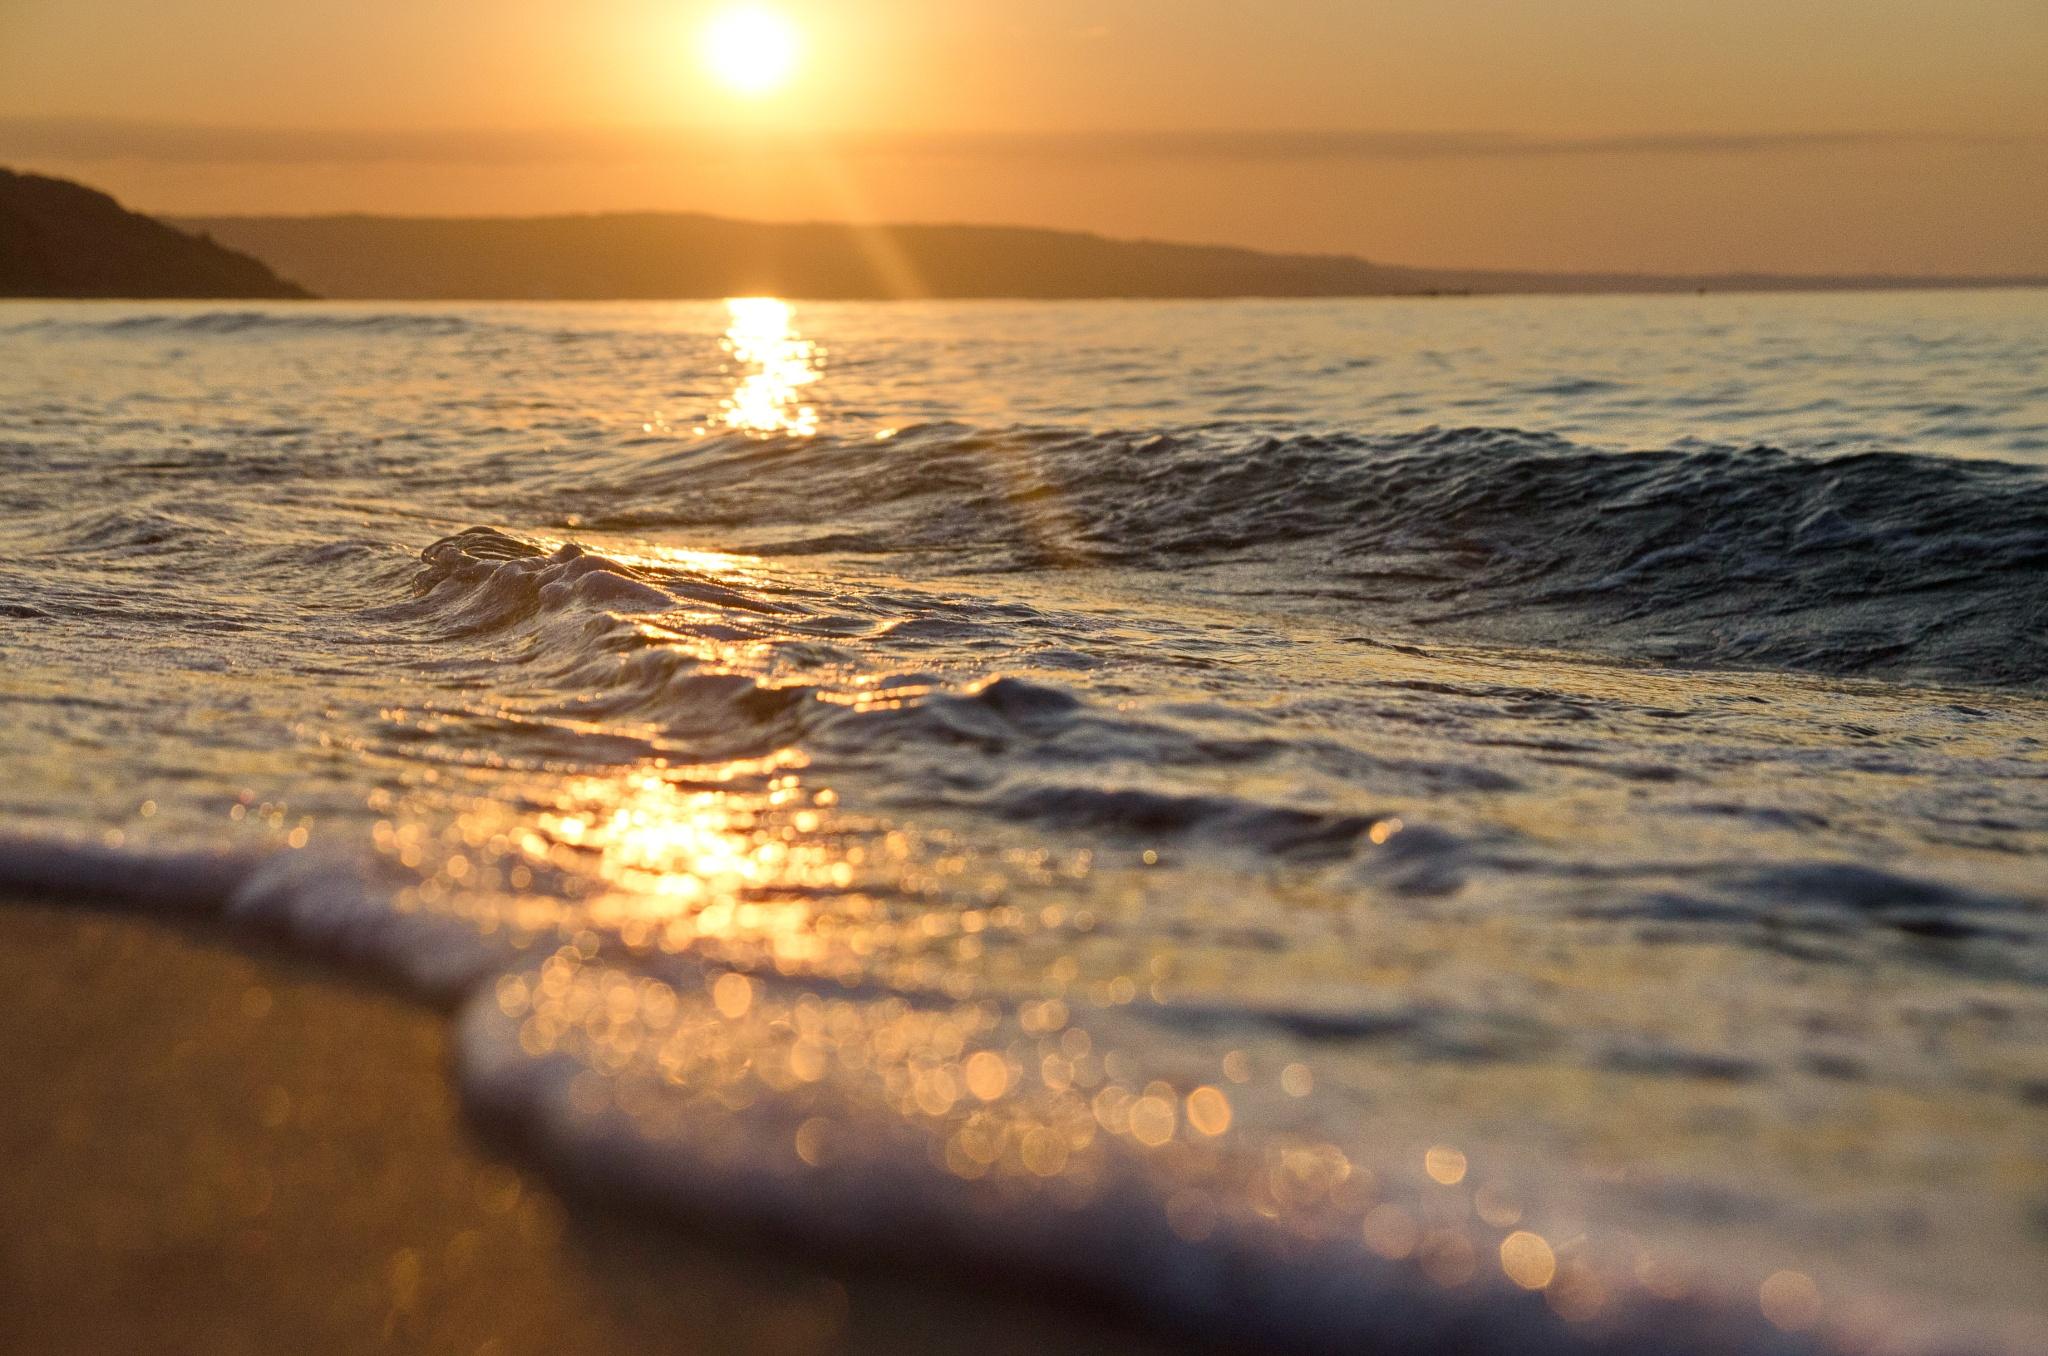 sunrise wave by edyctin